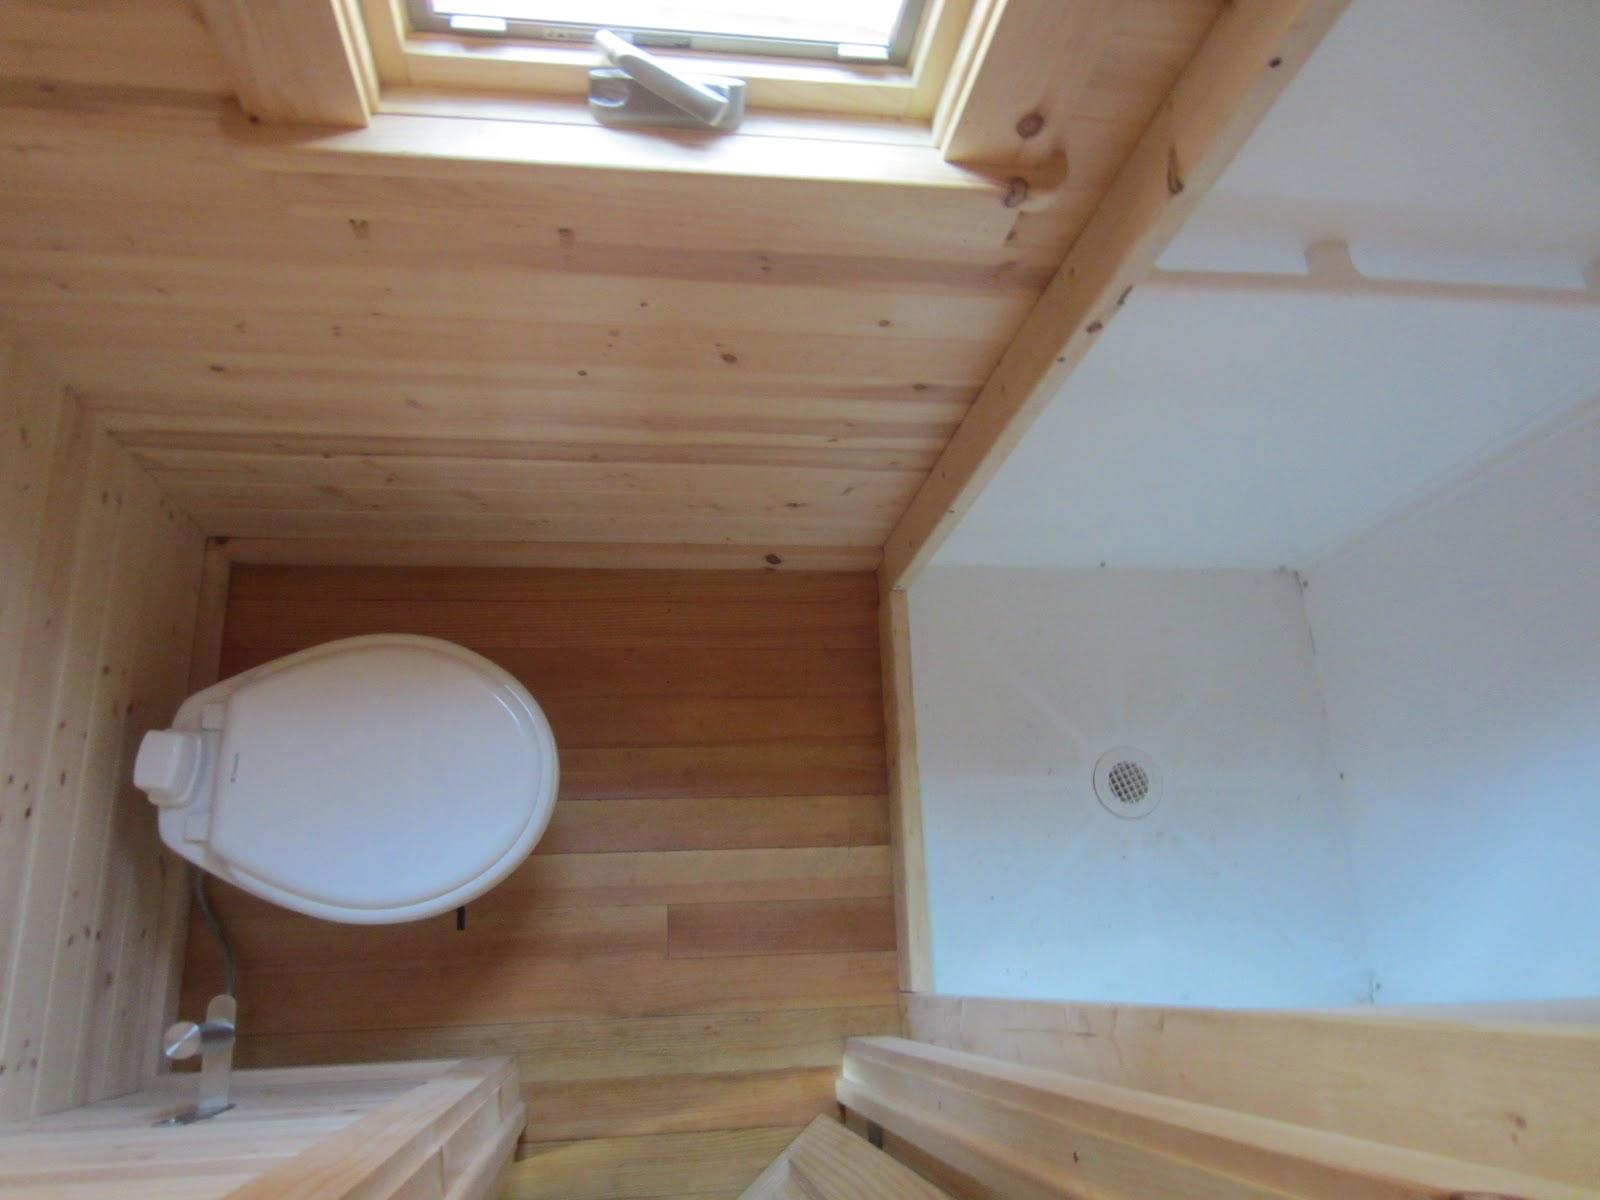 Tiny Home Bathroom Design: Relaxshacks.com: Tiny House/Tumbleweed Fencl Photos From